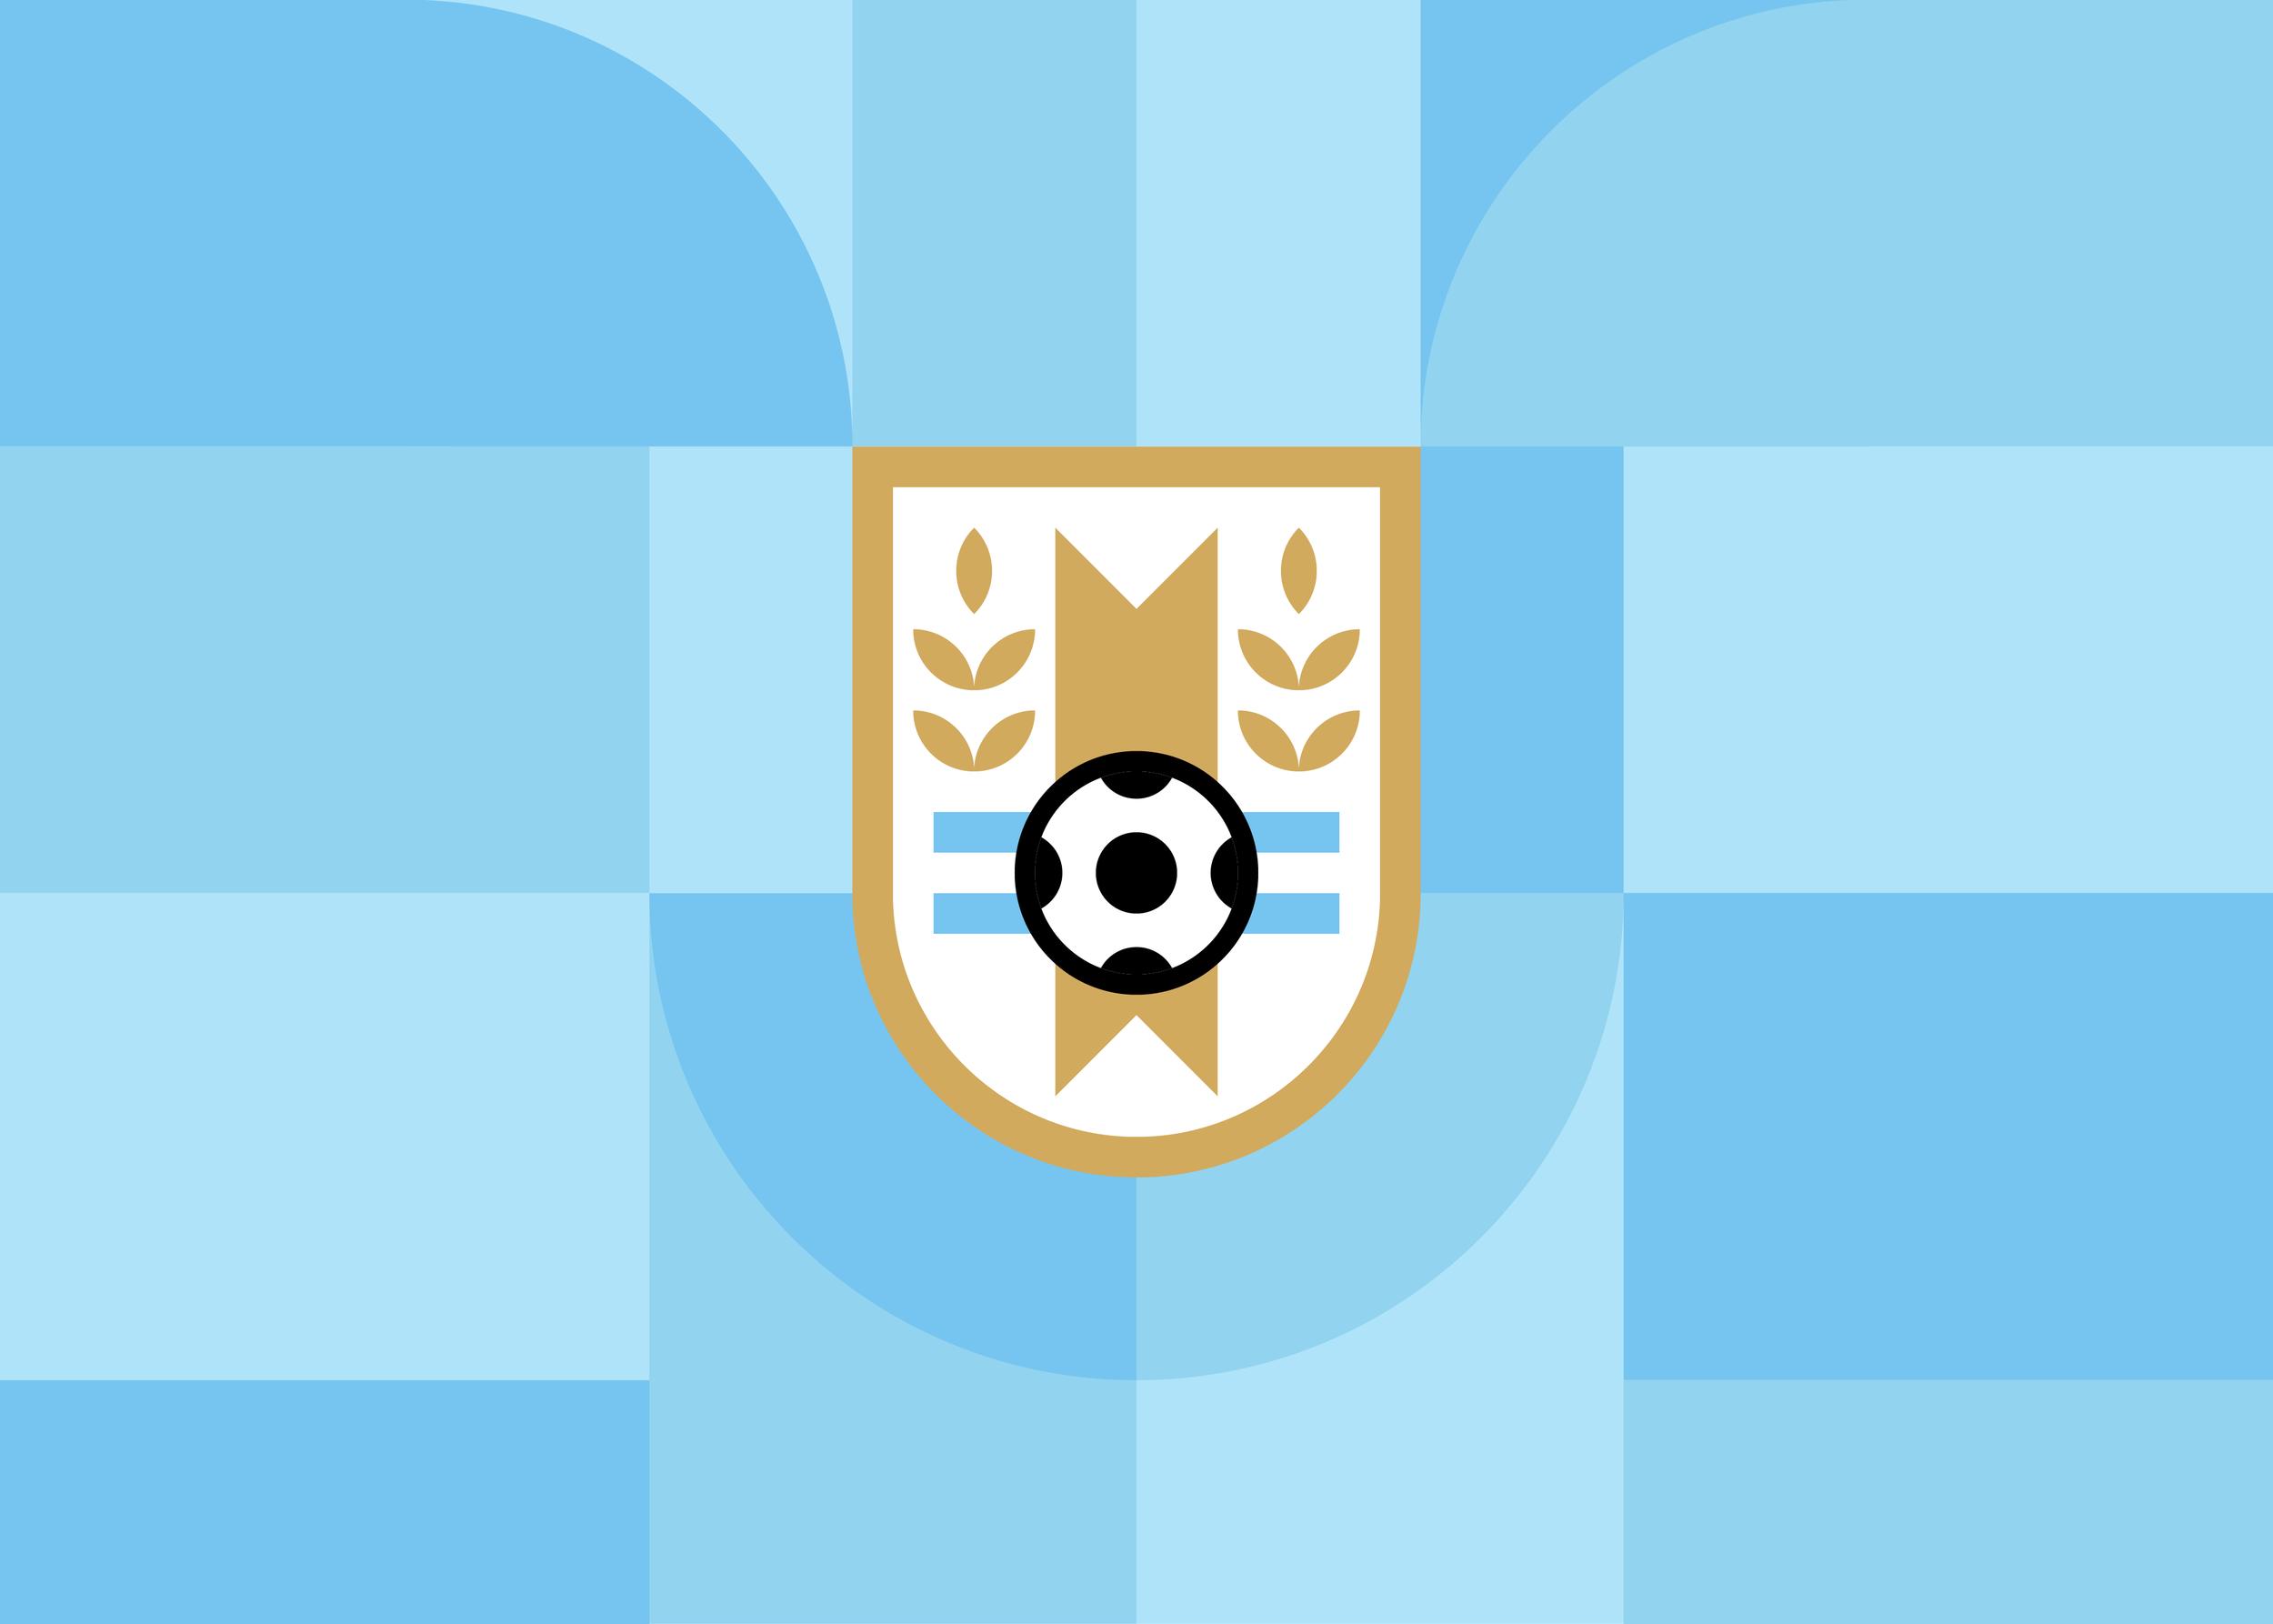 Uruguay-Geometric-World-Cup-Football-Badge-01-Logo-Design-Freelance-Kent.png